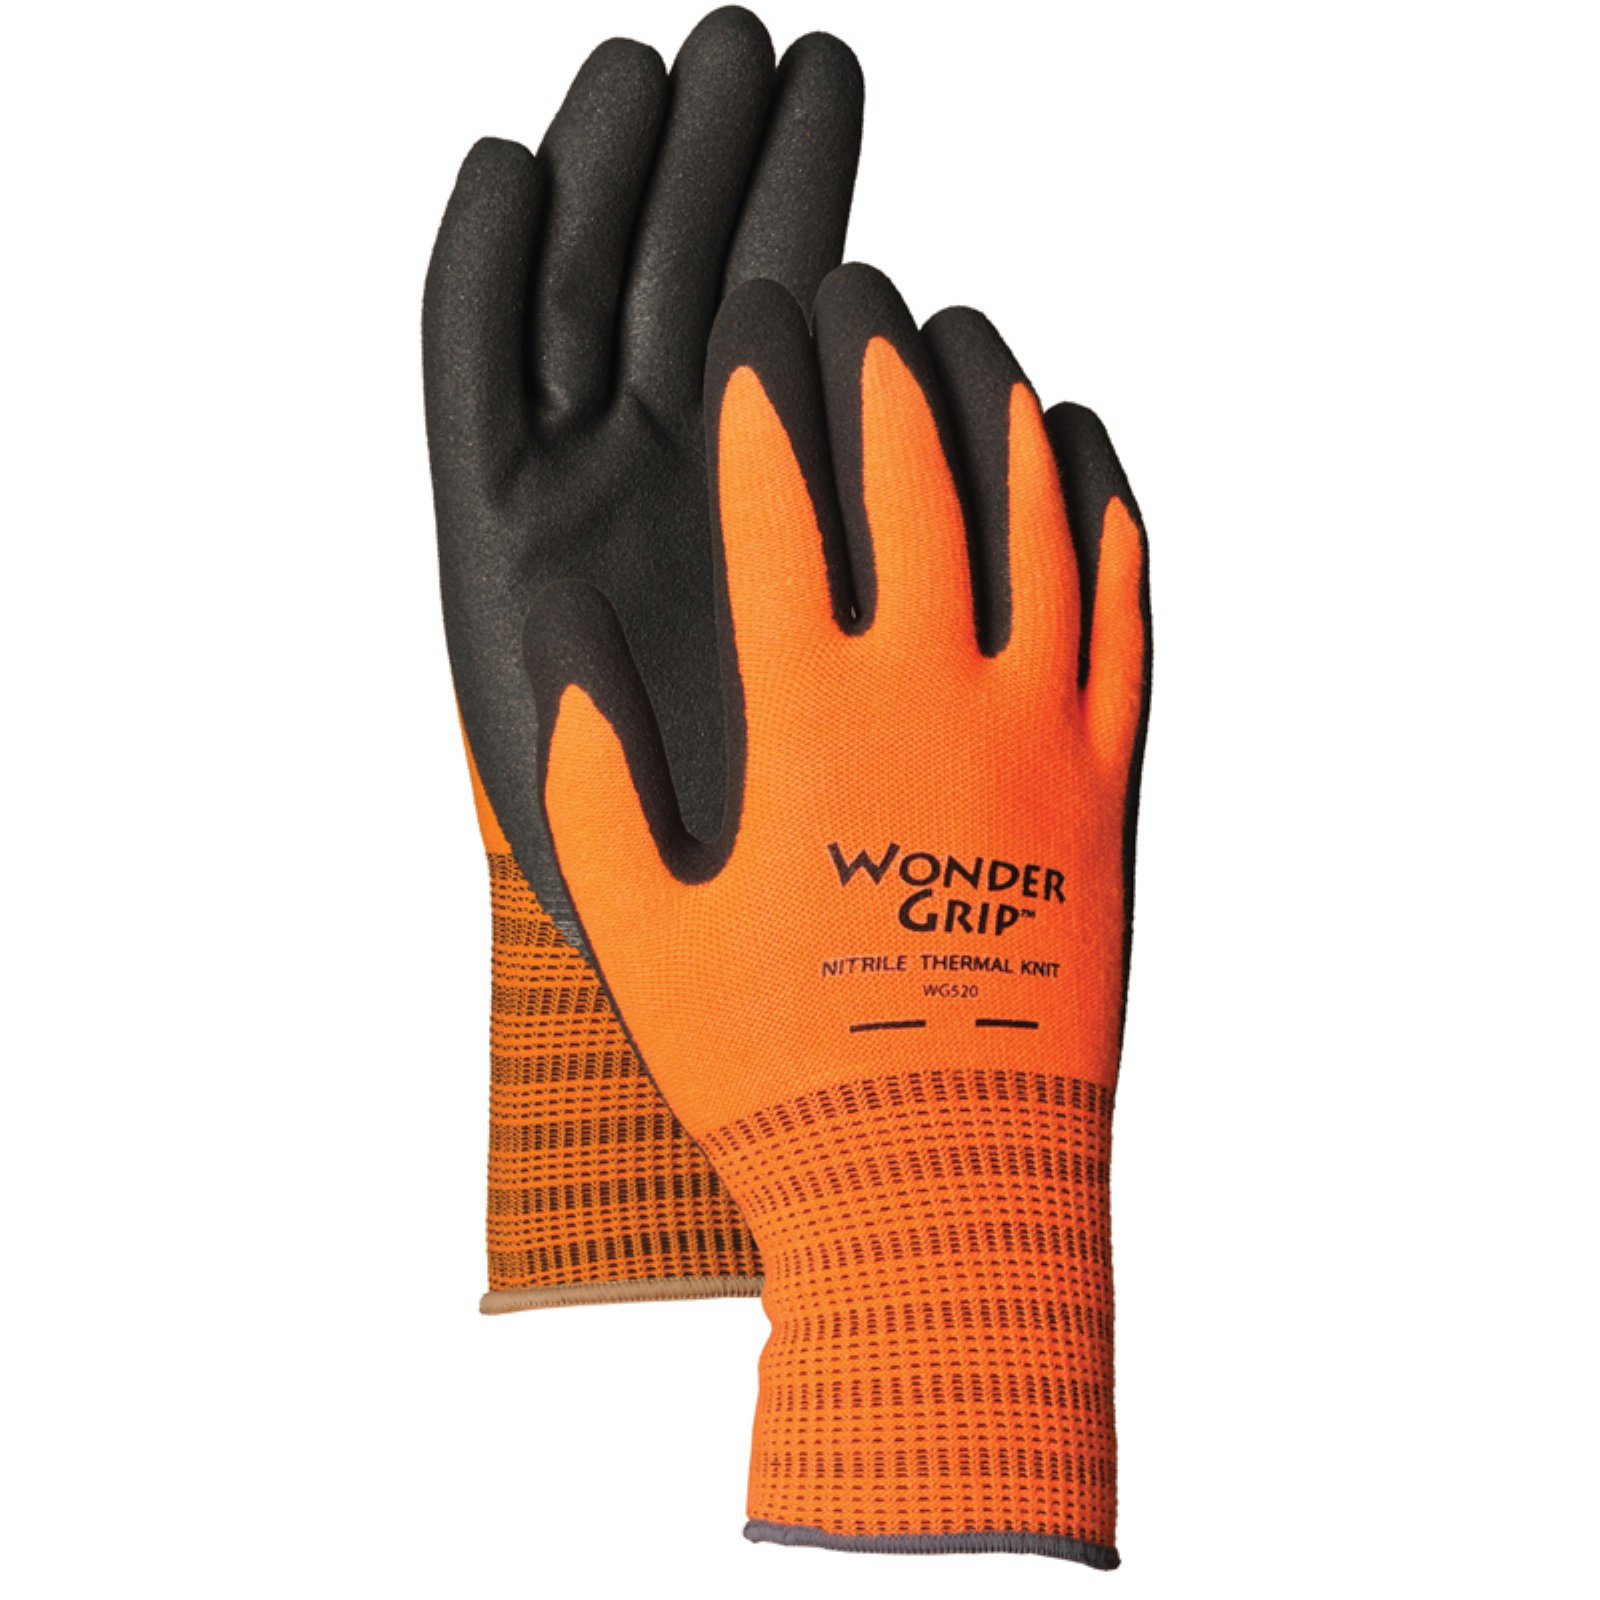 LFS Medium Wonder Grip High Visibility Nitrile Palm Gloves